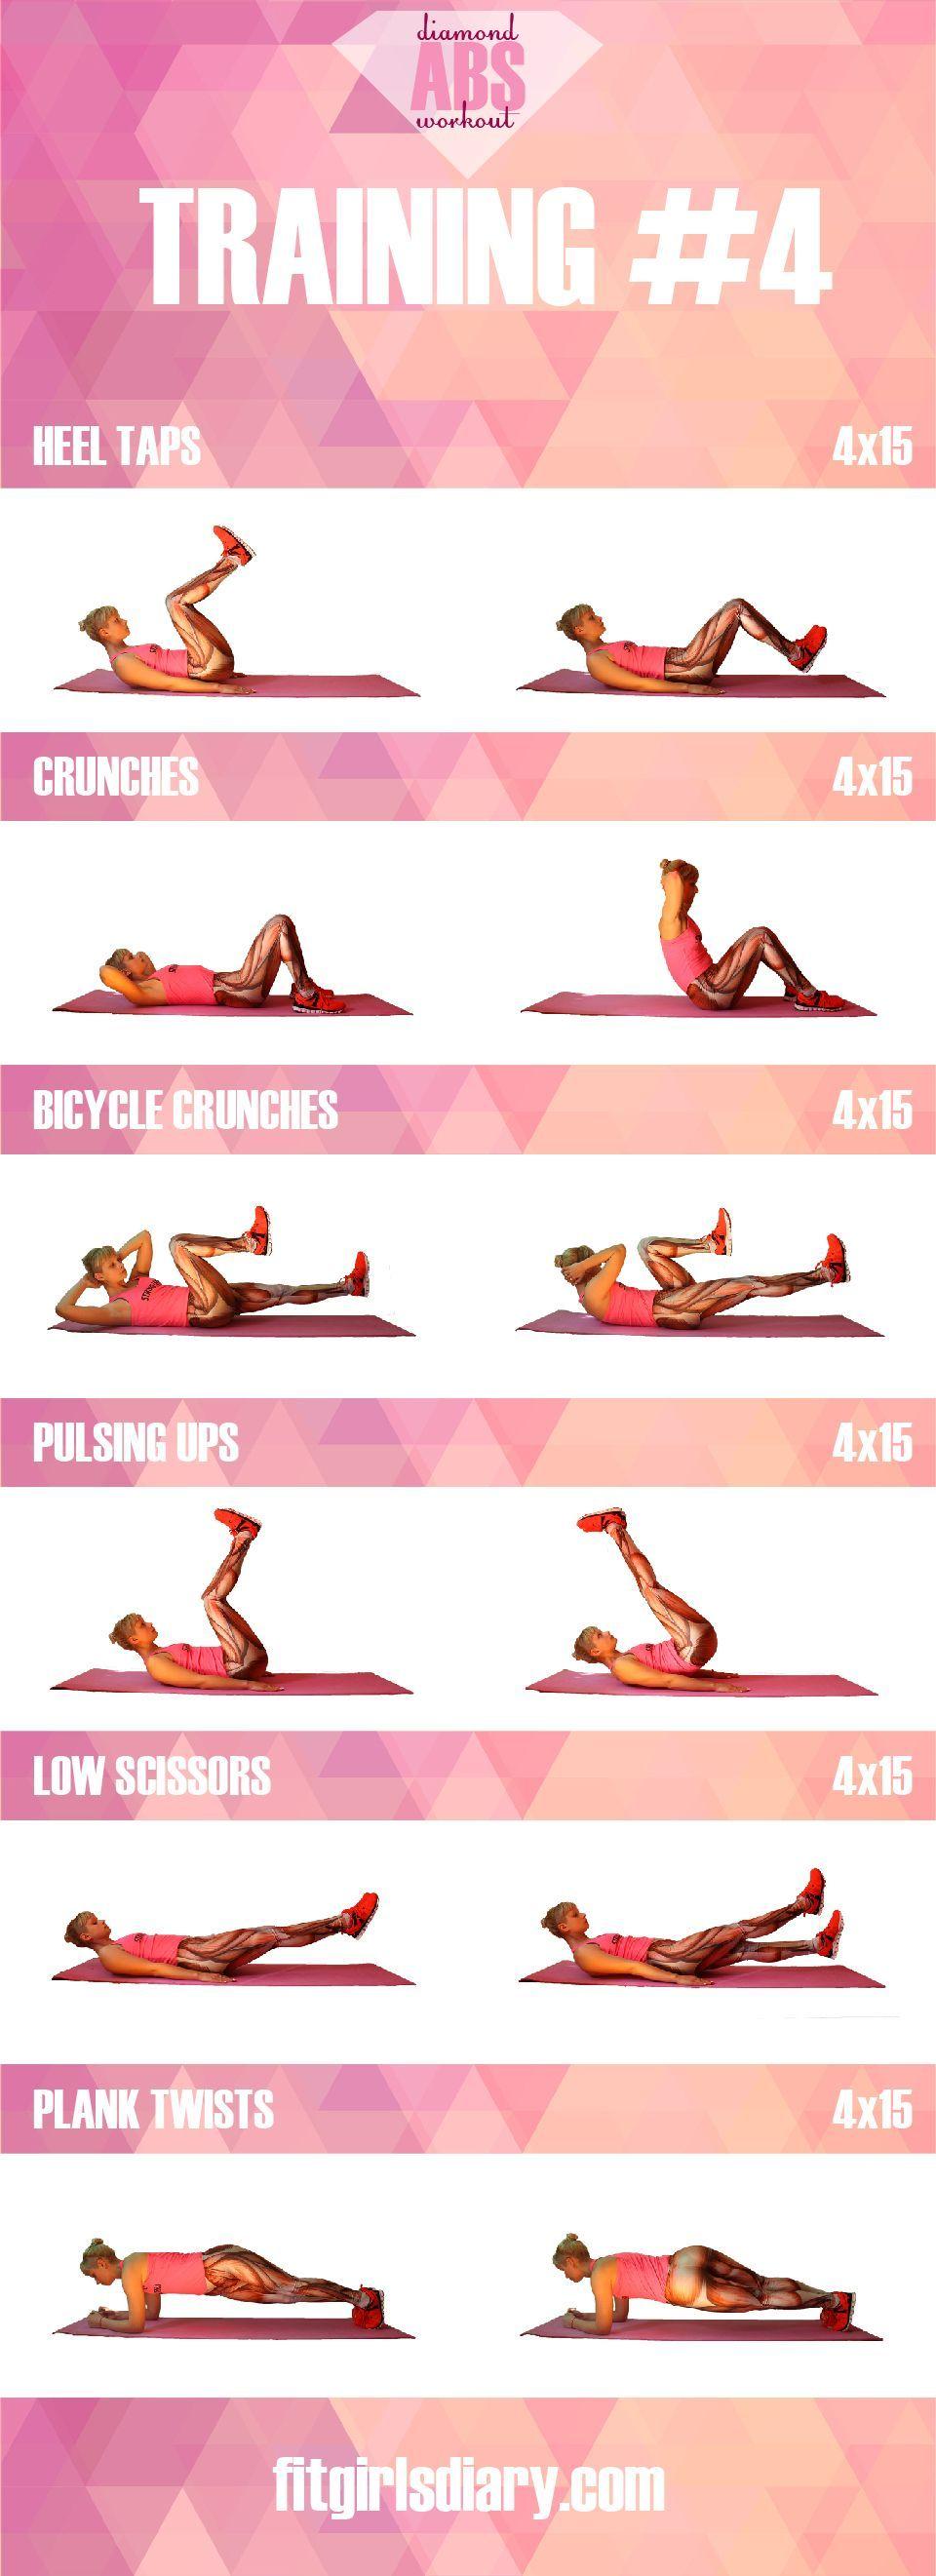 Abdomen exercises for ladies